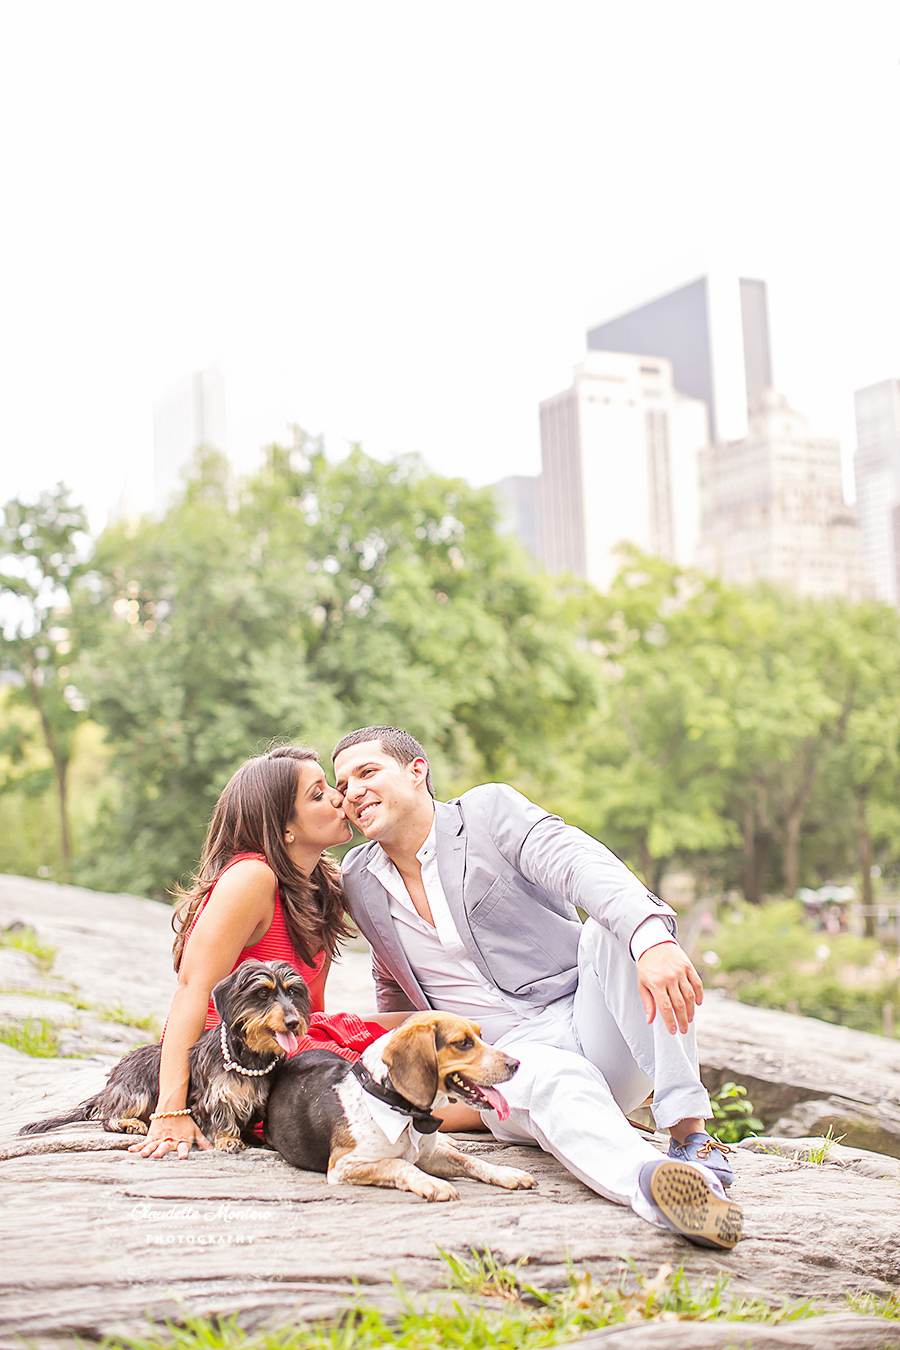 claudette-montero-photography-amaris-emmanuel-new-york-engagement-session-yaska-crespo-wedding-planner-web-logo-9889